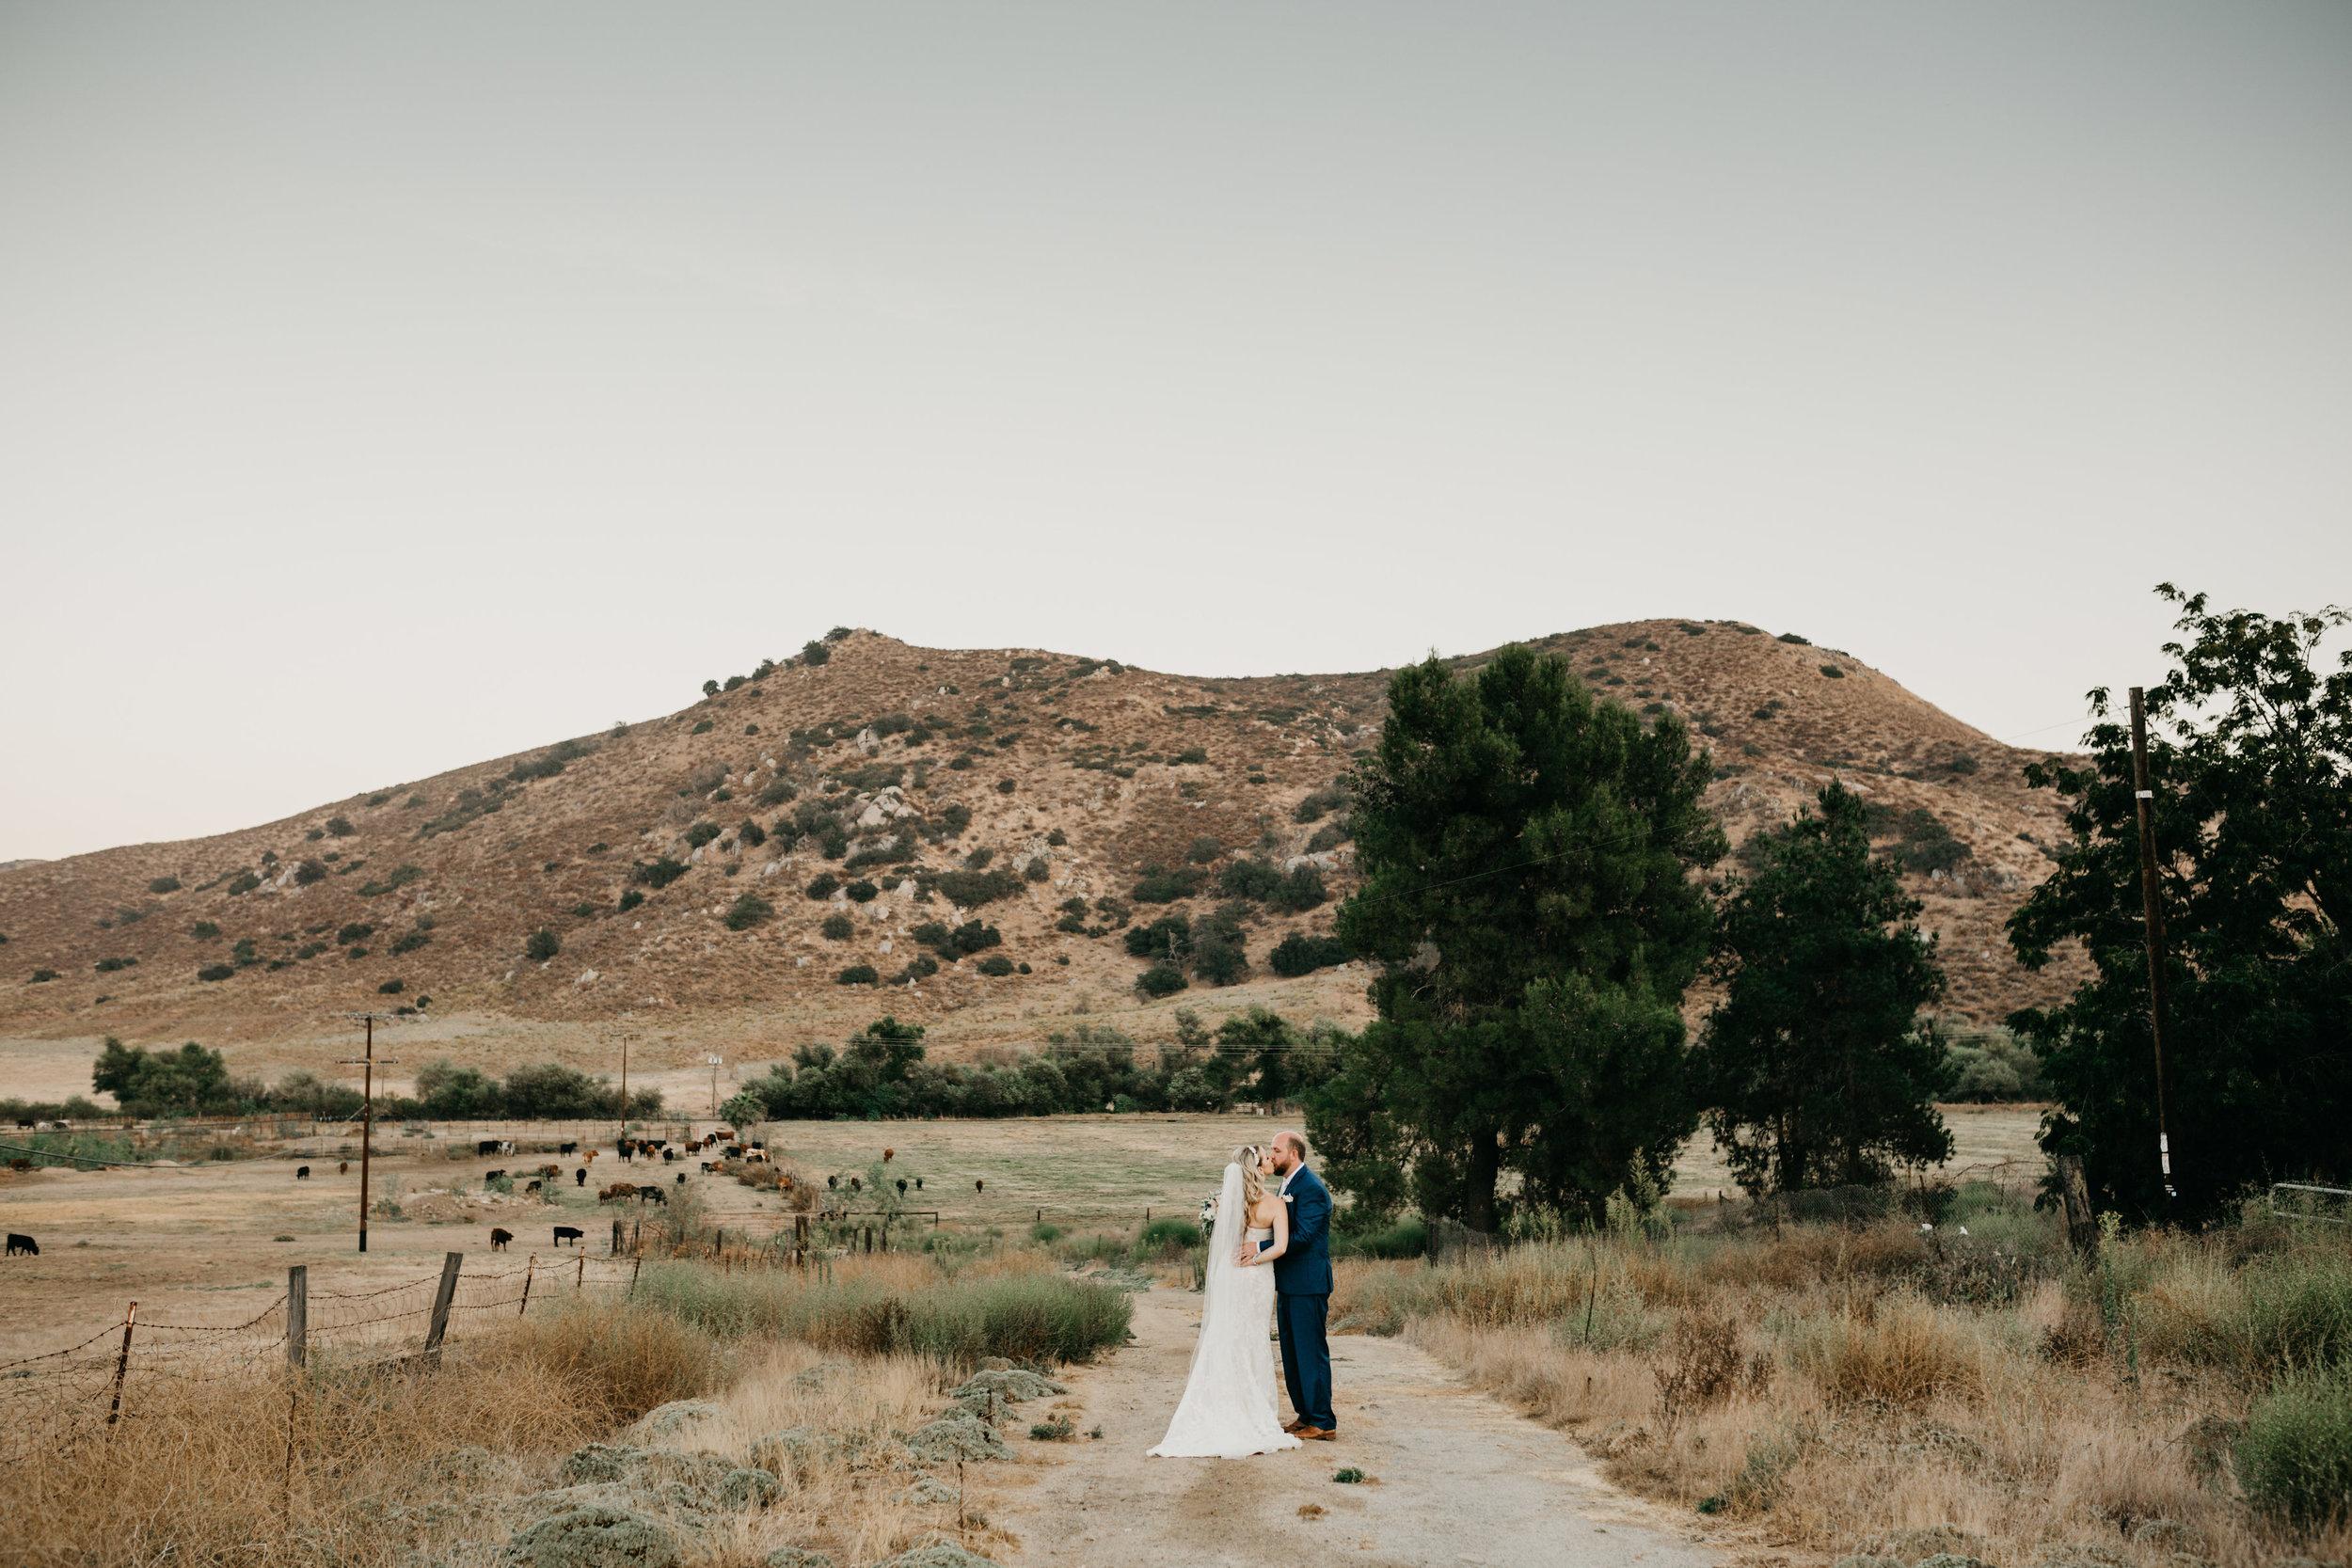 DianaLakePhoto-L+M-San-Diego-Wedding-Mr&Mrs93.jpg